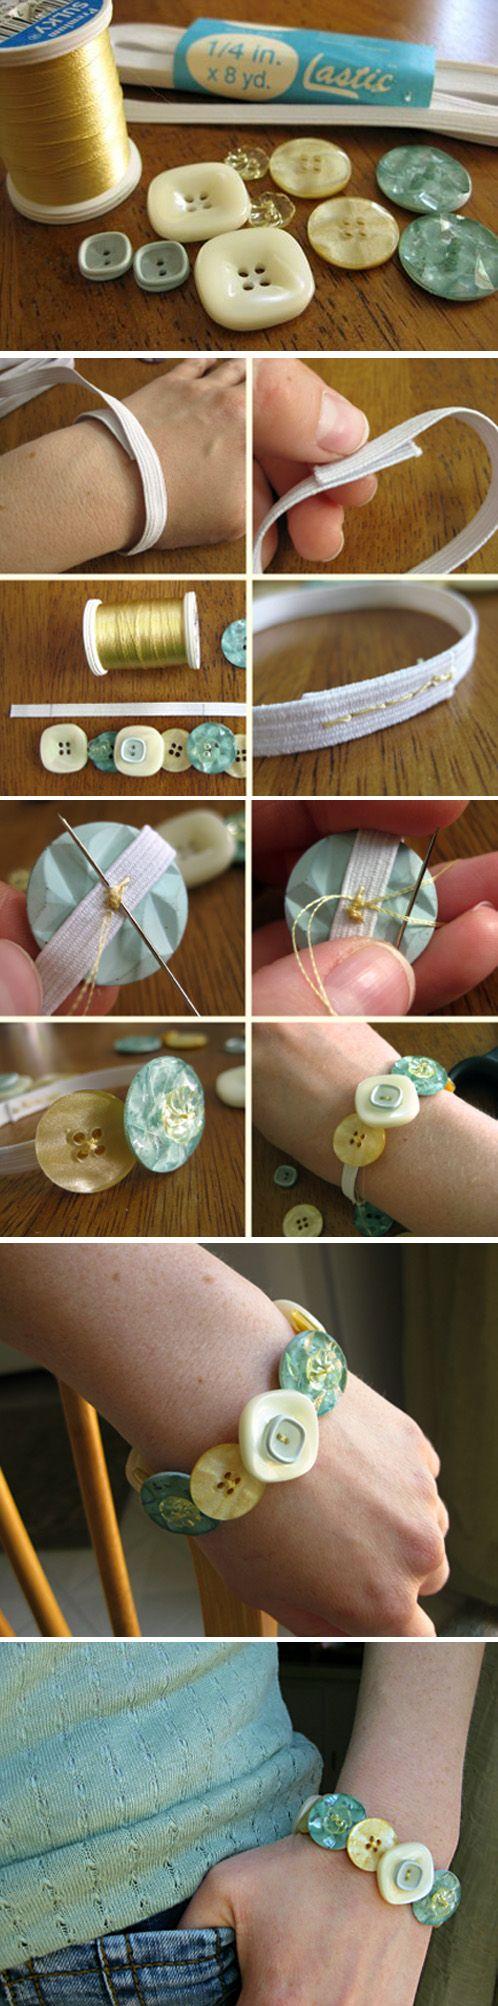 pulsera-botones-diy-muy-ingenioso-1: